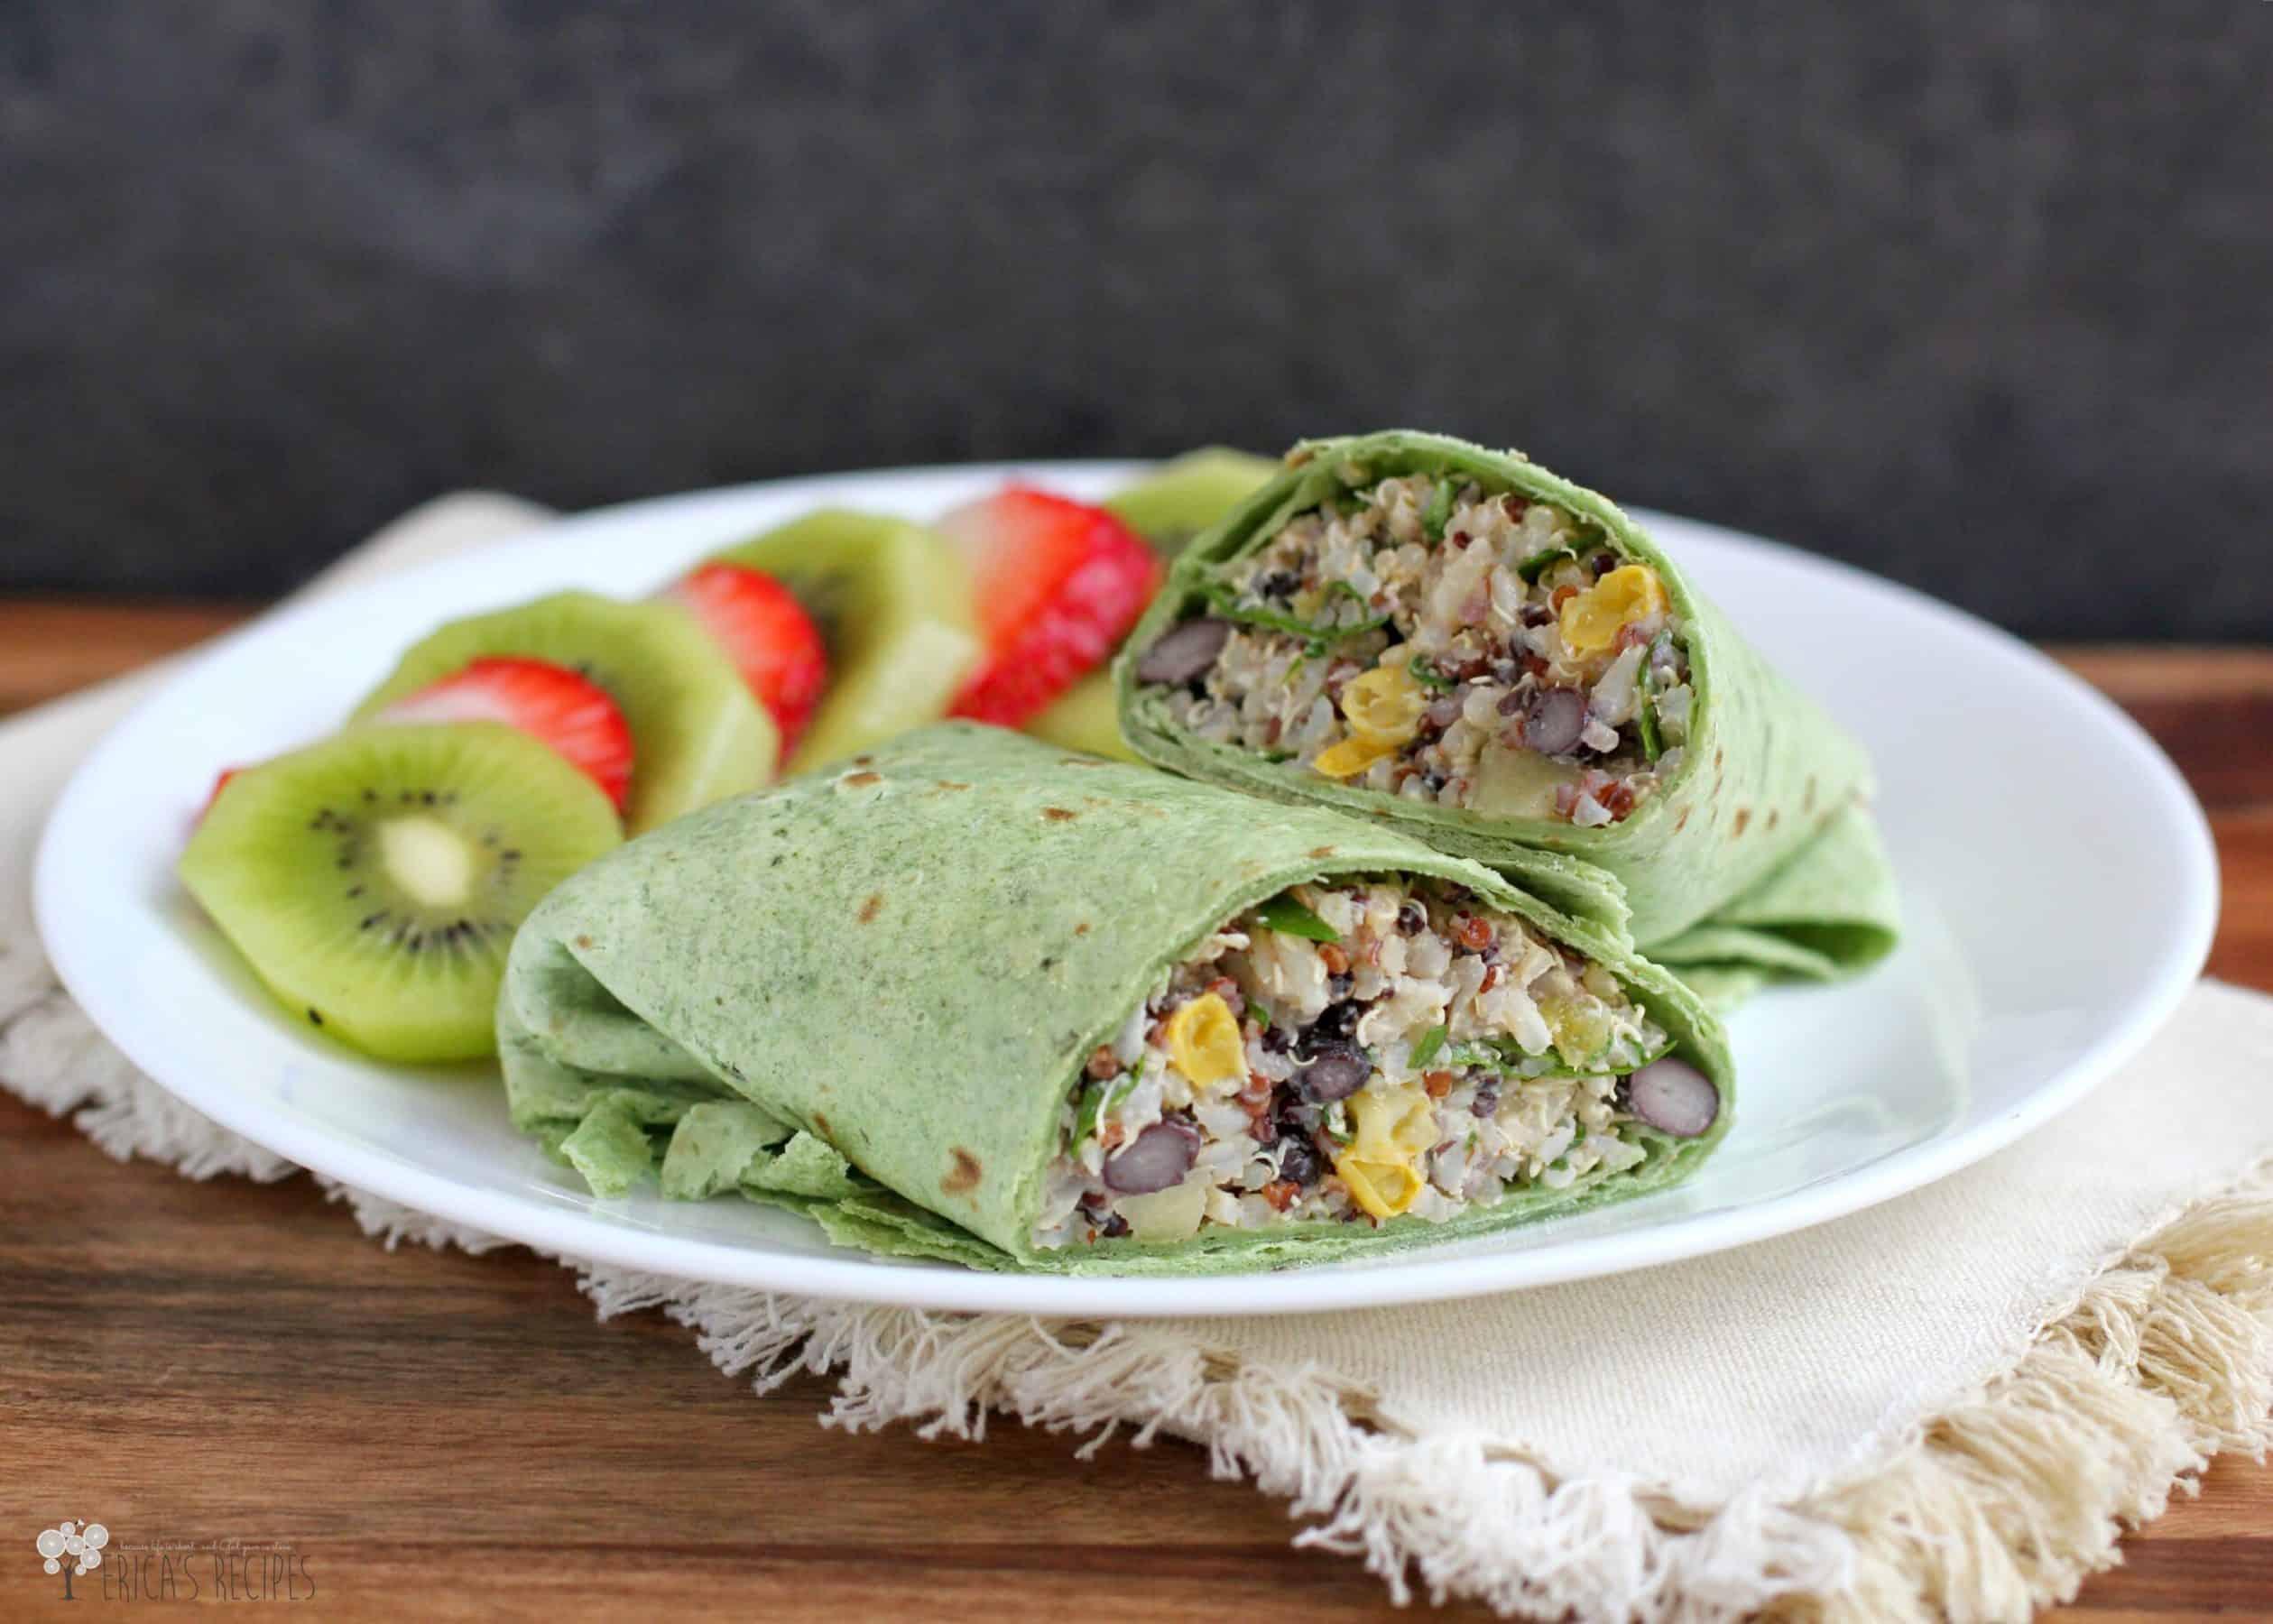 Quinoa and Black Bean Power Wraps